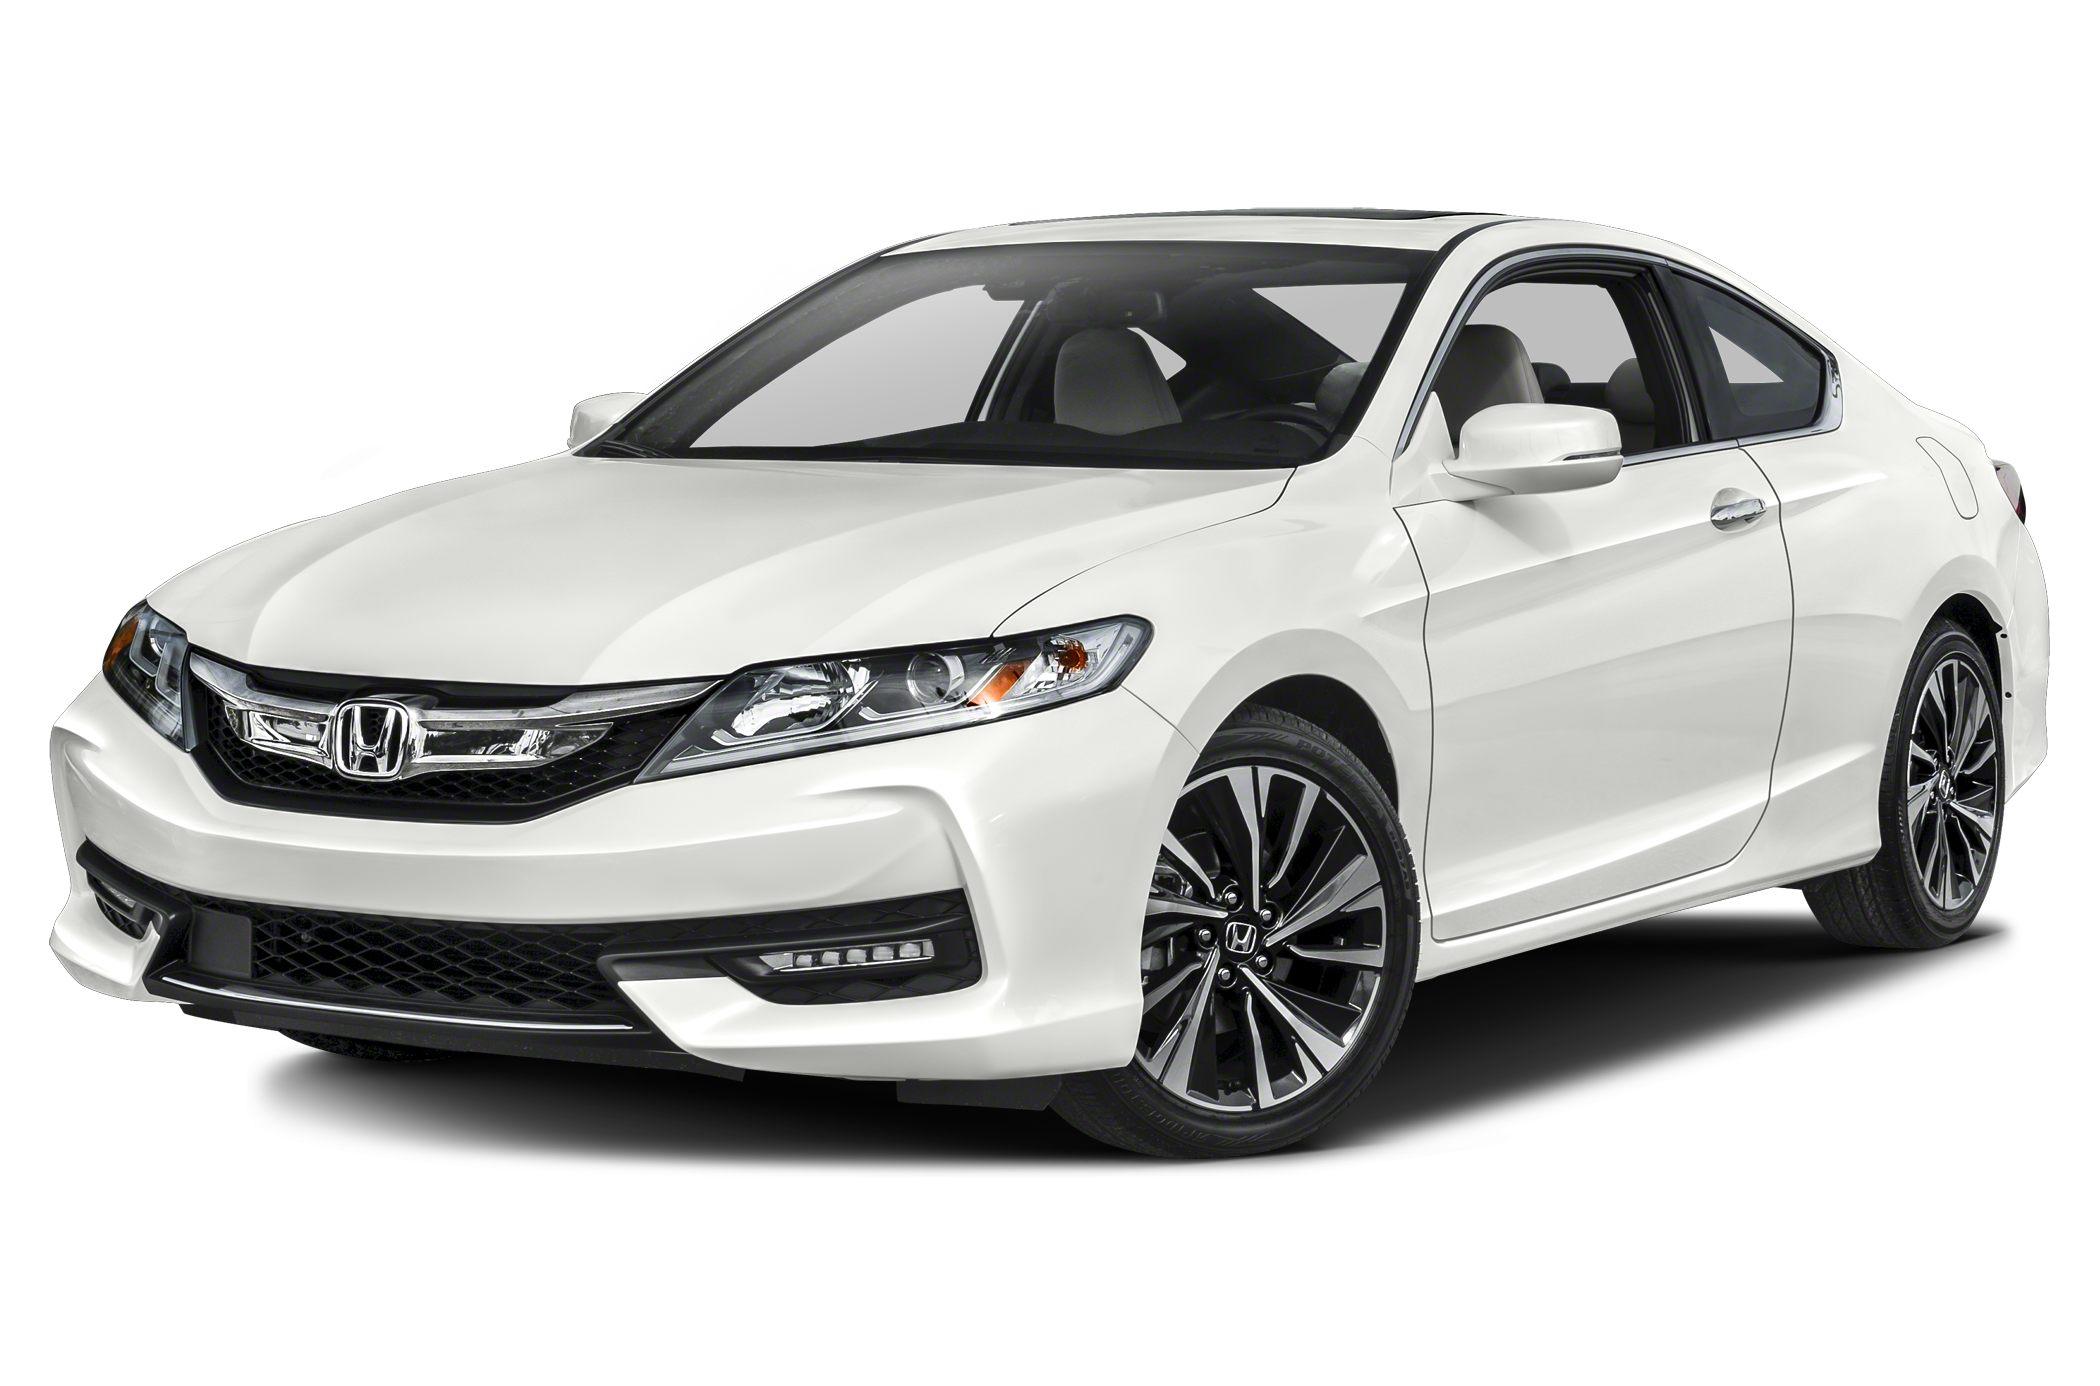 2016 Honda Accord EX-L w Navigation  Honda Sensing Buy a new Honda from Diamond Valley Honda in